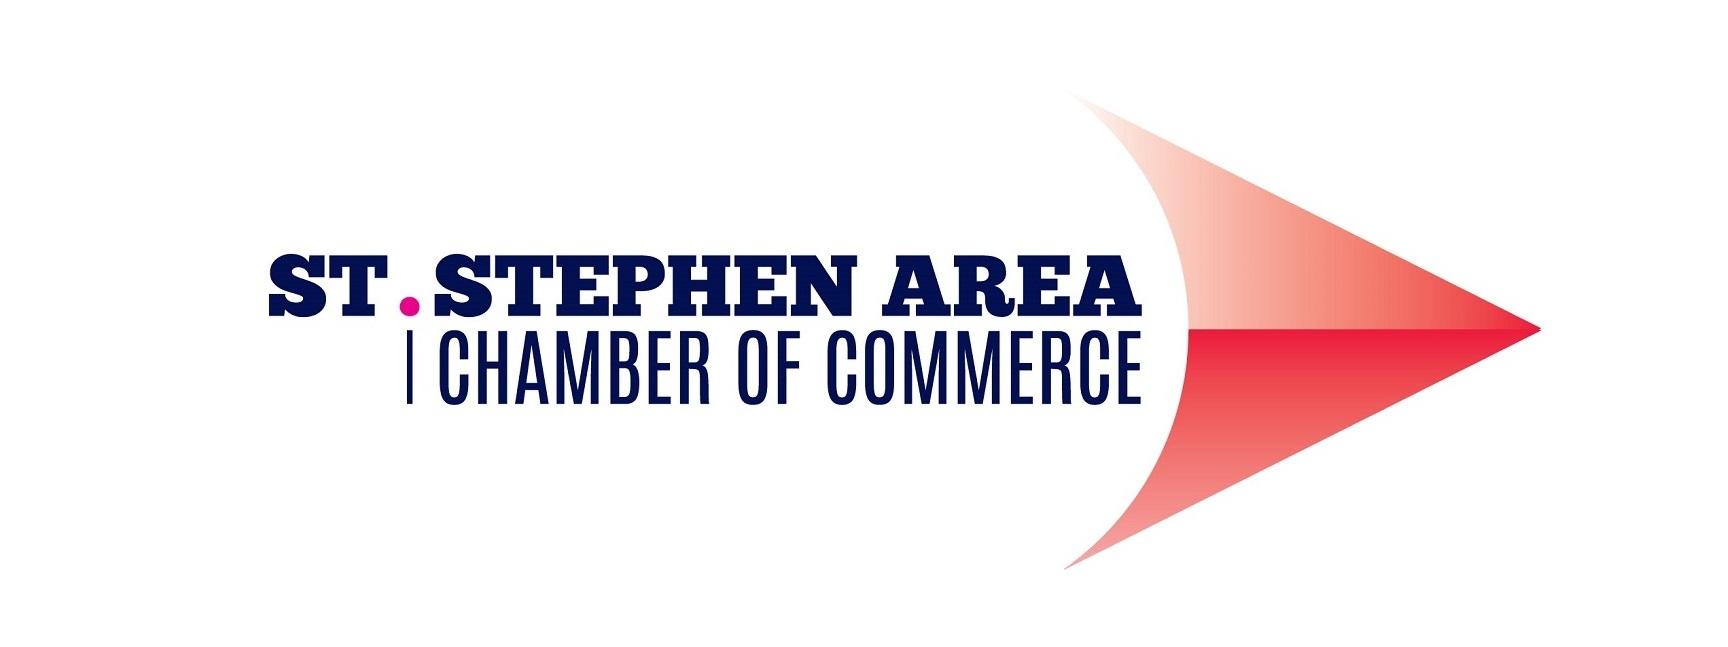 Chamber_logo_new_03 sized.jpg